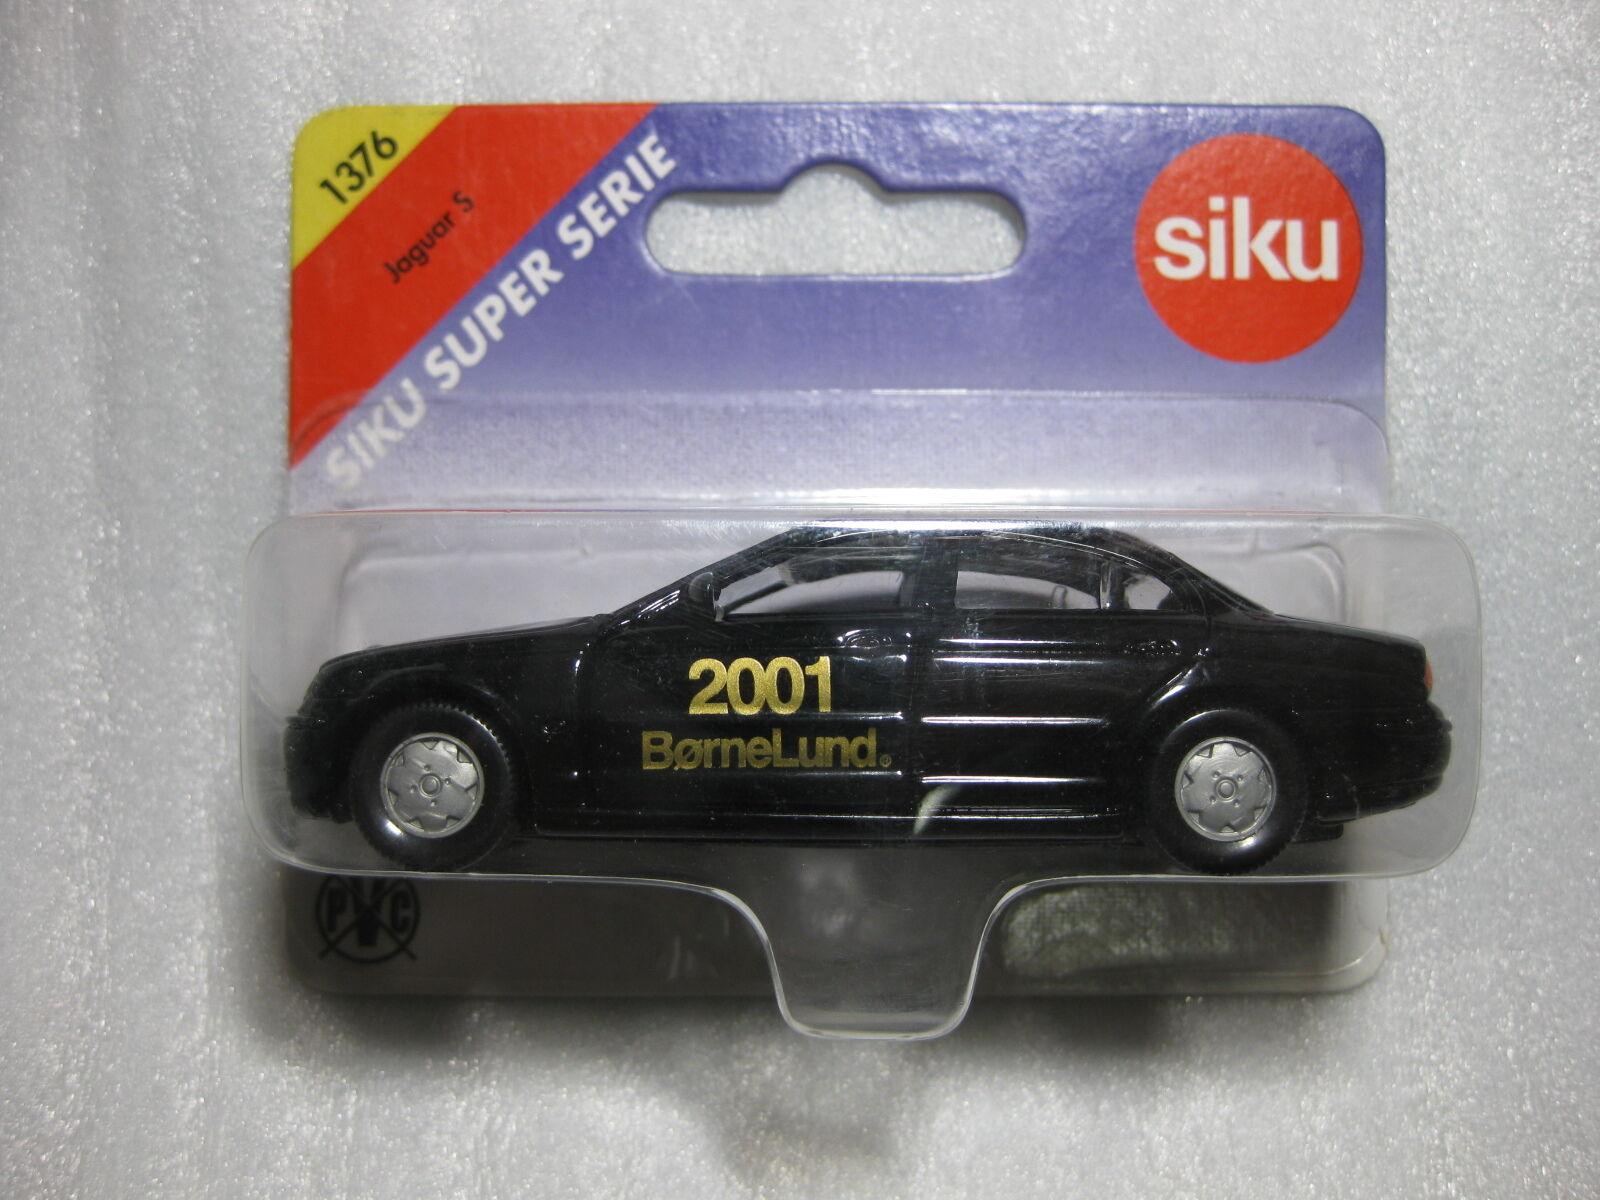 SIKU  JAGUAR S 4.0V8 bornelund 2001 Exclusive Diecast model rare promo  vente avec grande remise